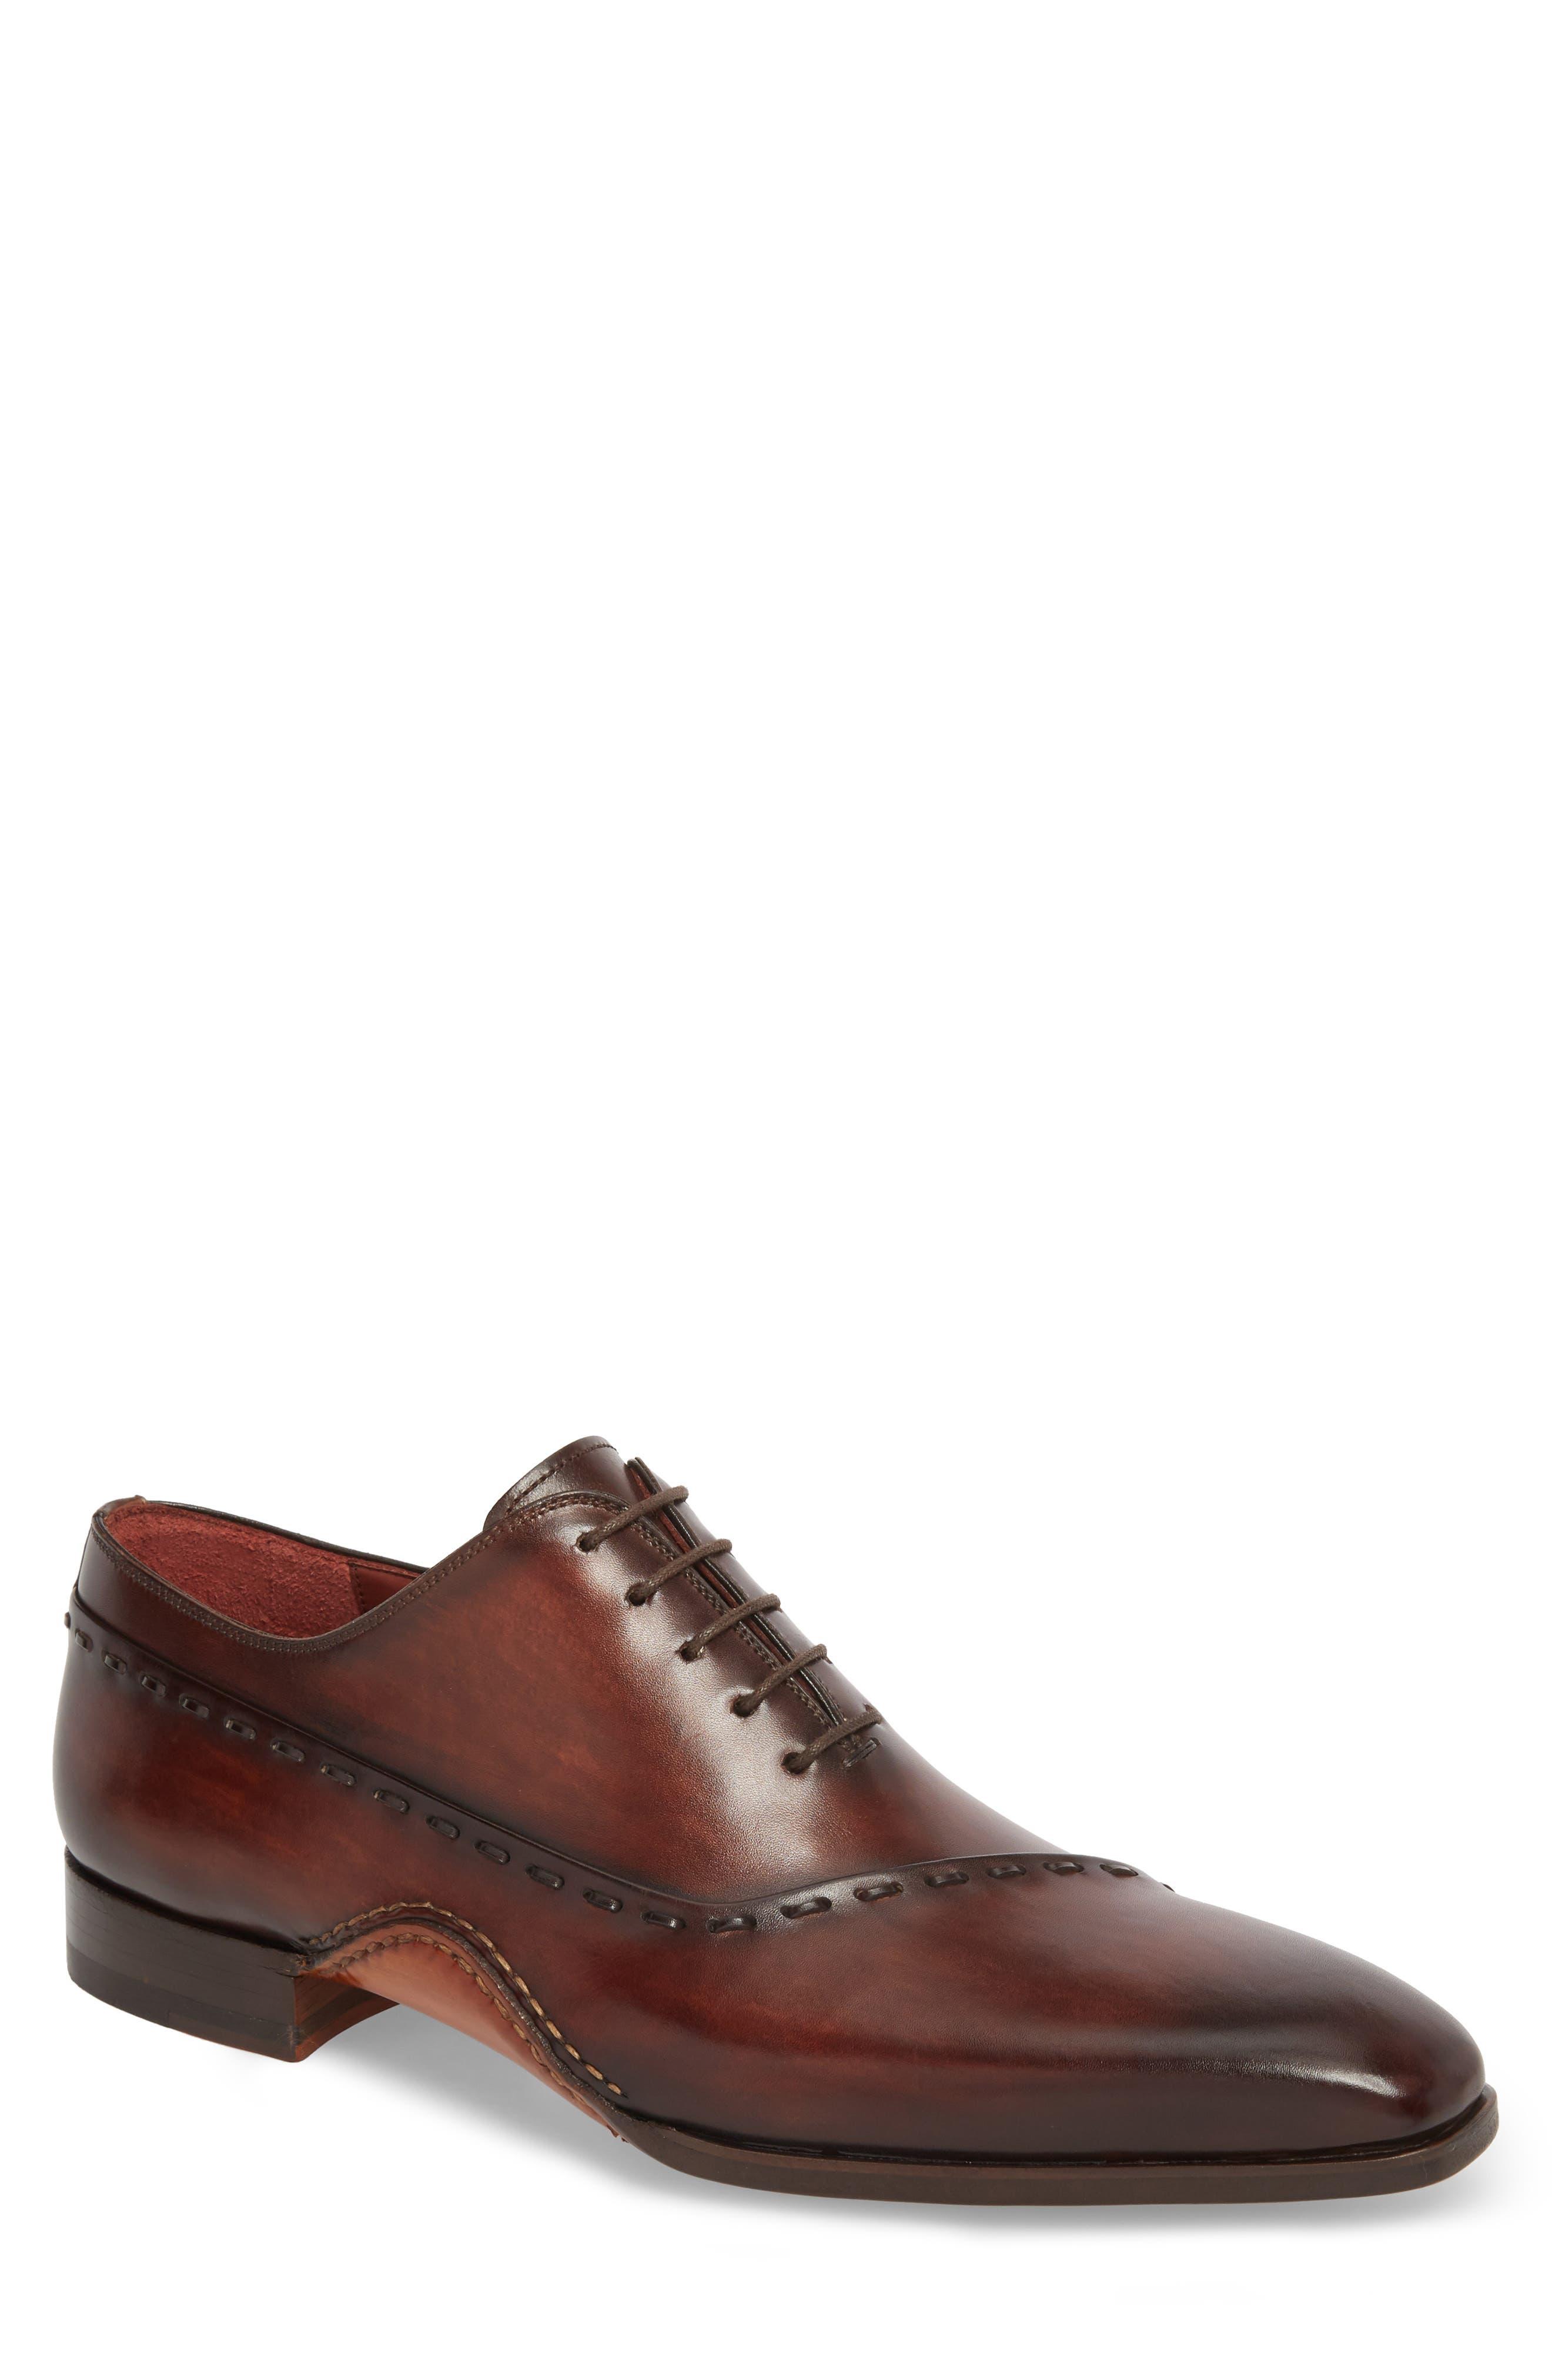 Kobe Asymmetrical Whole Cut Shoe,                         Main,                         color, Mid-Brown Leather